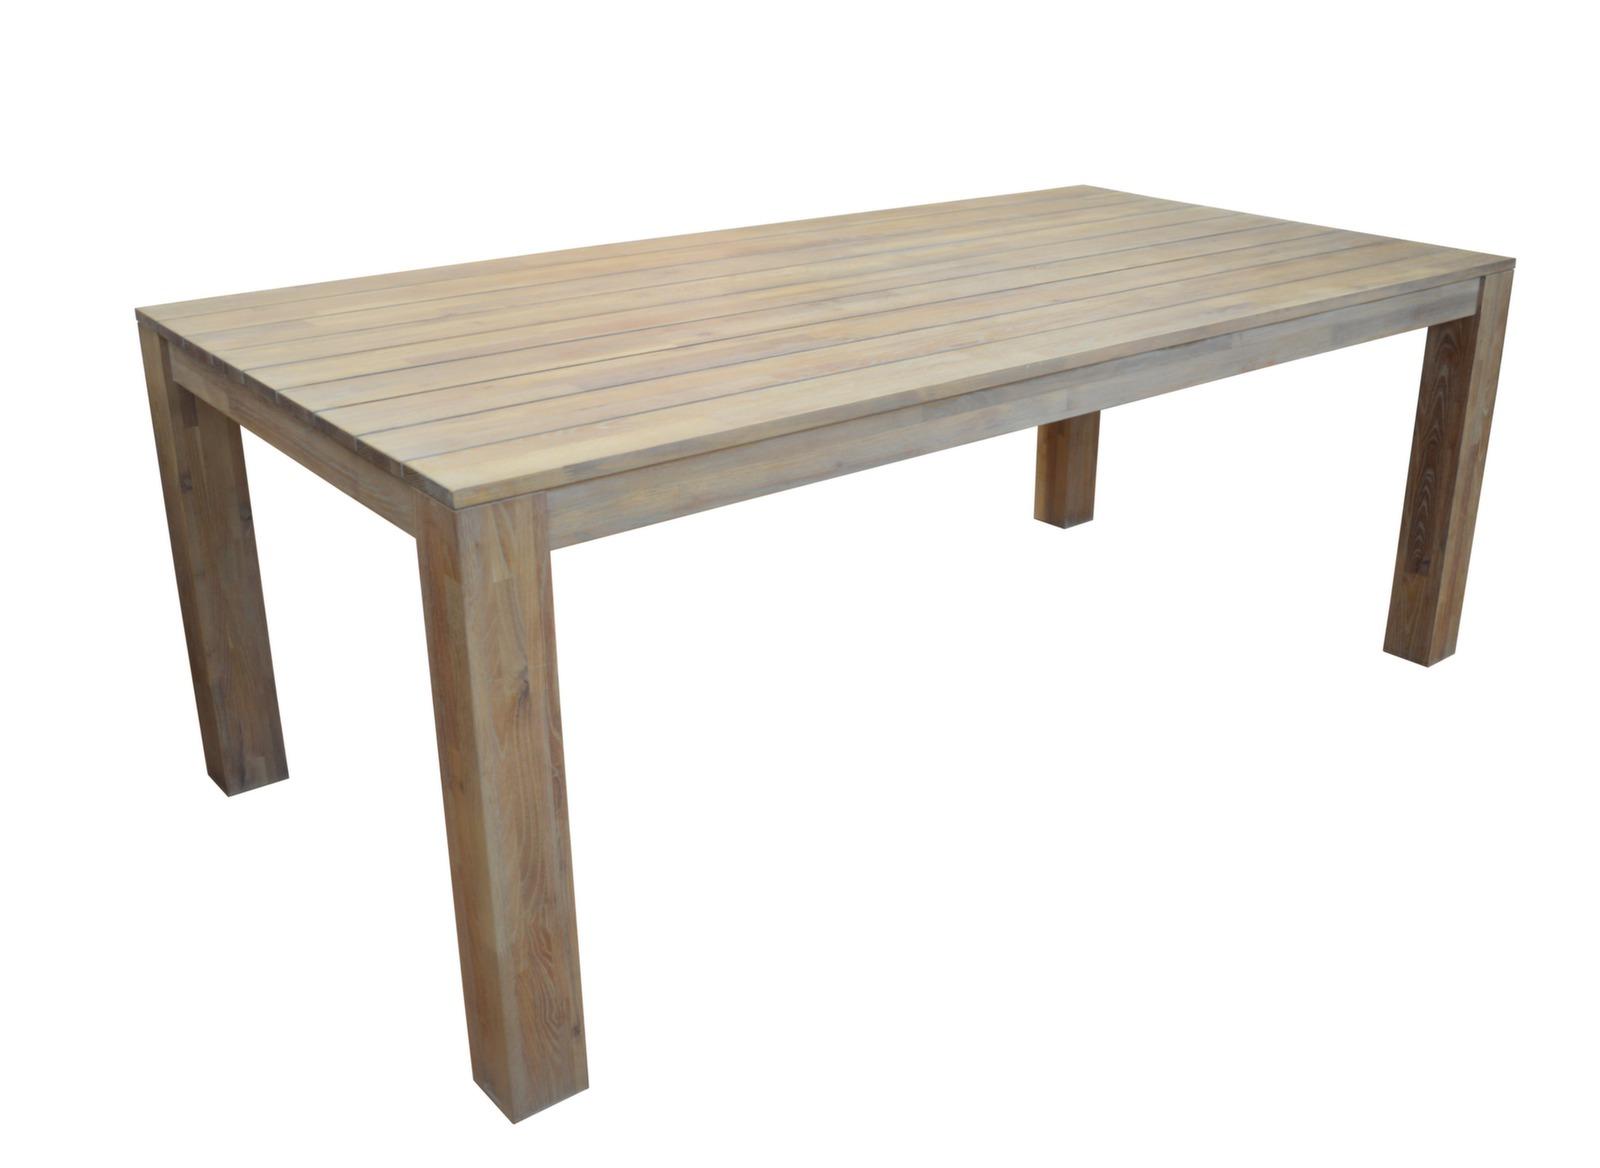 Table de jardin en bois rectangle Kéa - Meubles jardin ...